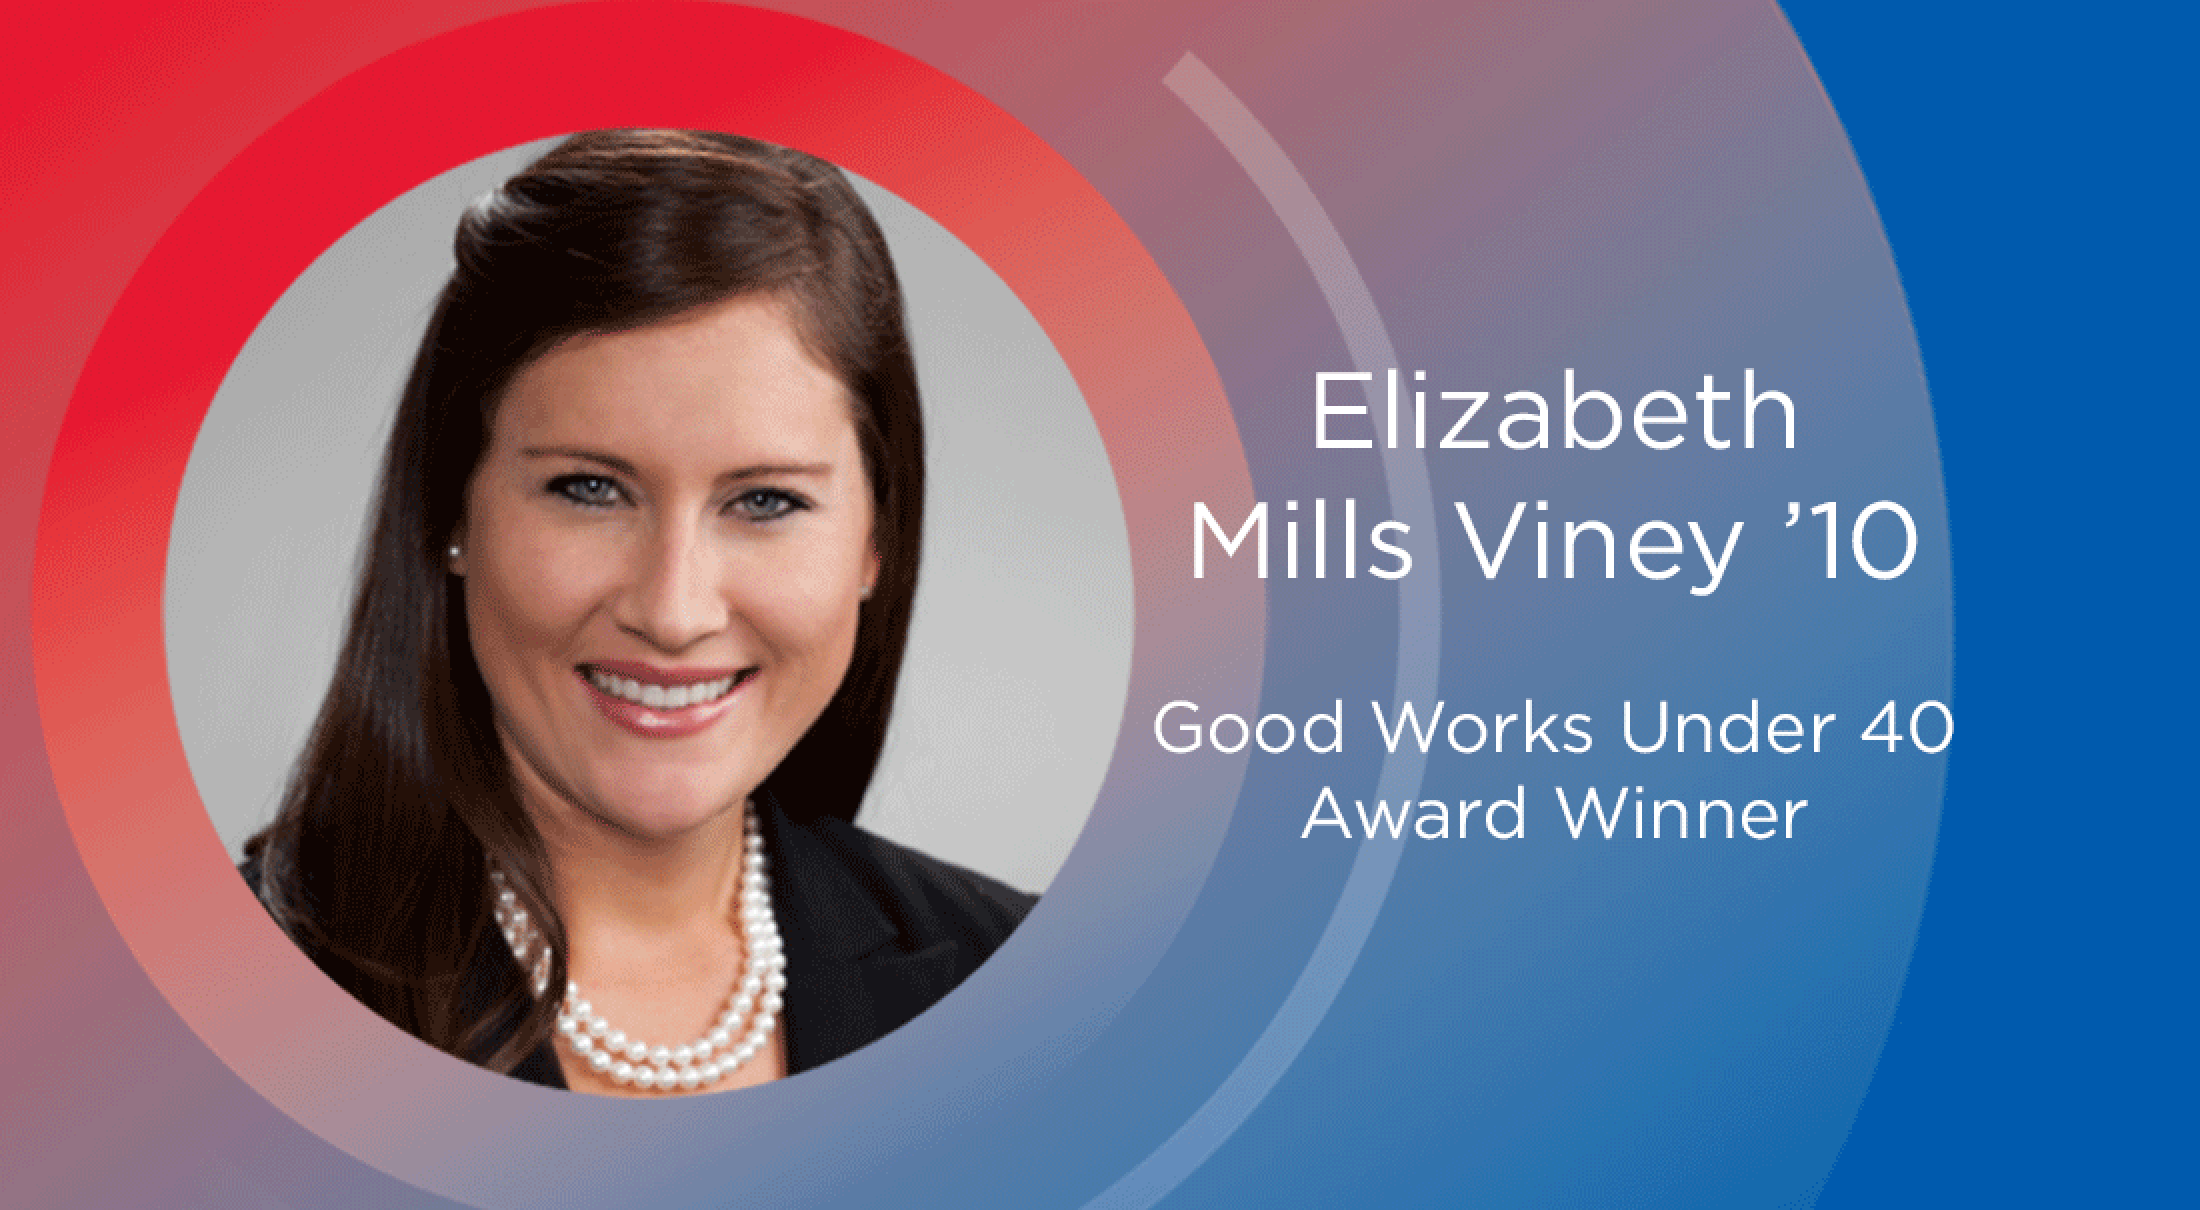 SMU alumna Elizabeth Viney '10 won the Good Works under 40 Award.